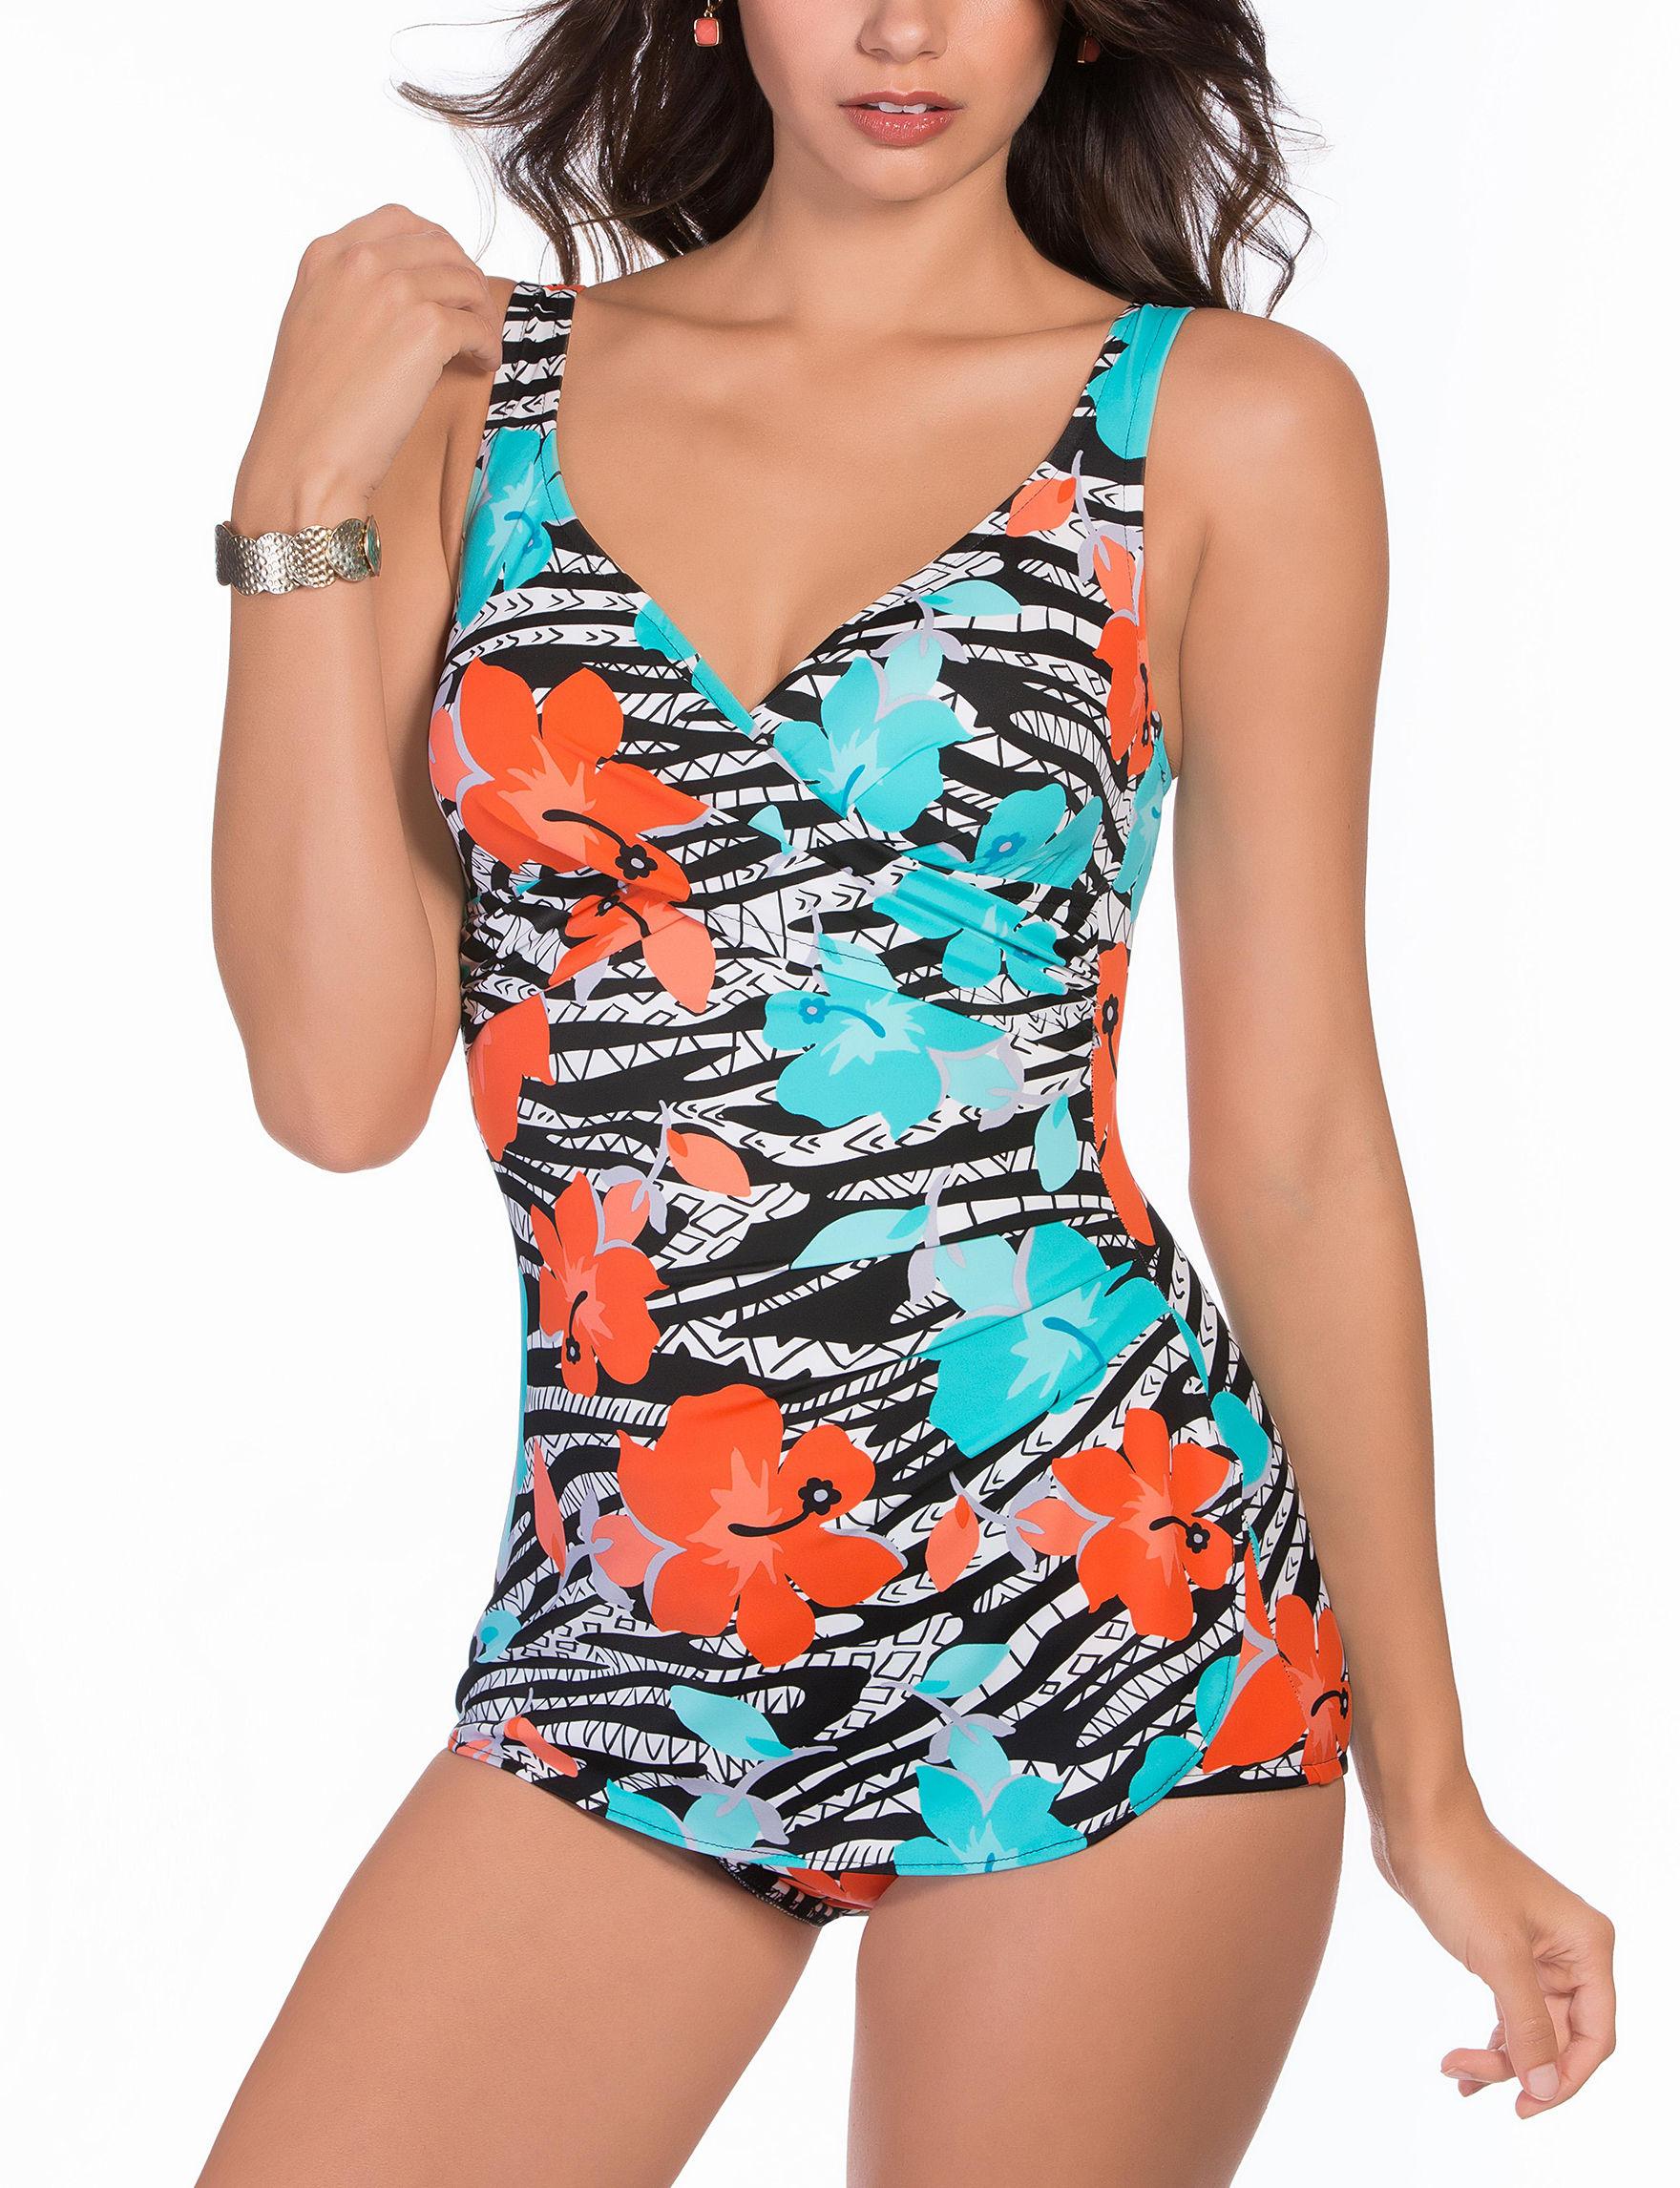 Penbrooke Multi One-piece Swimsuits